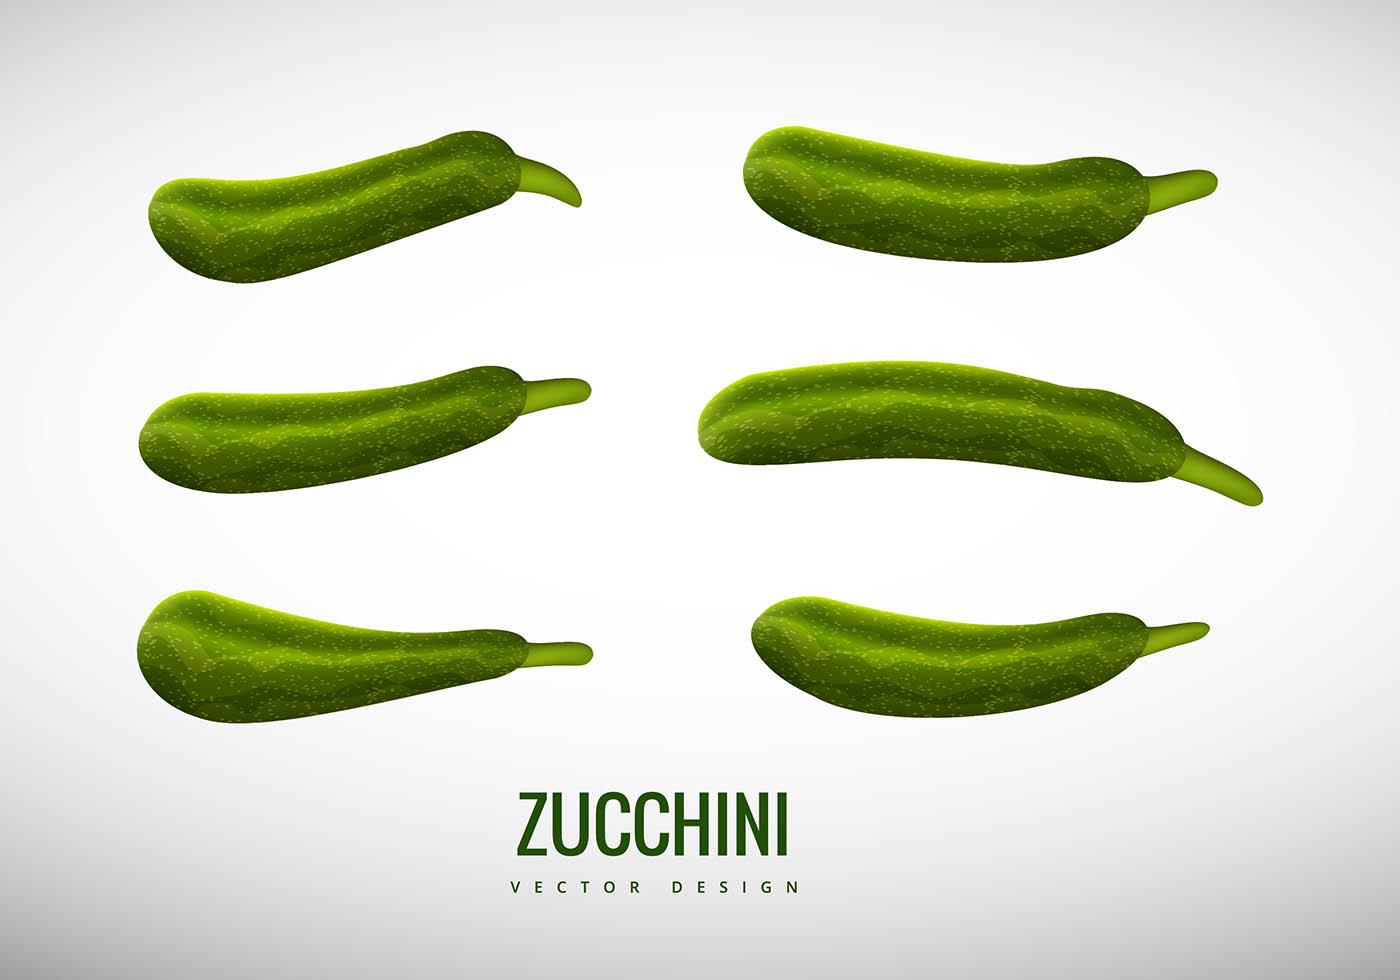 zucchini vector download free vector art stock graphics